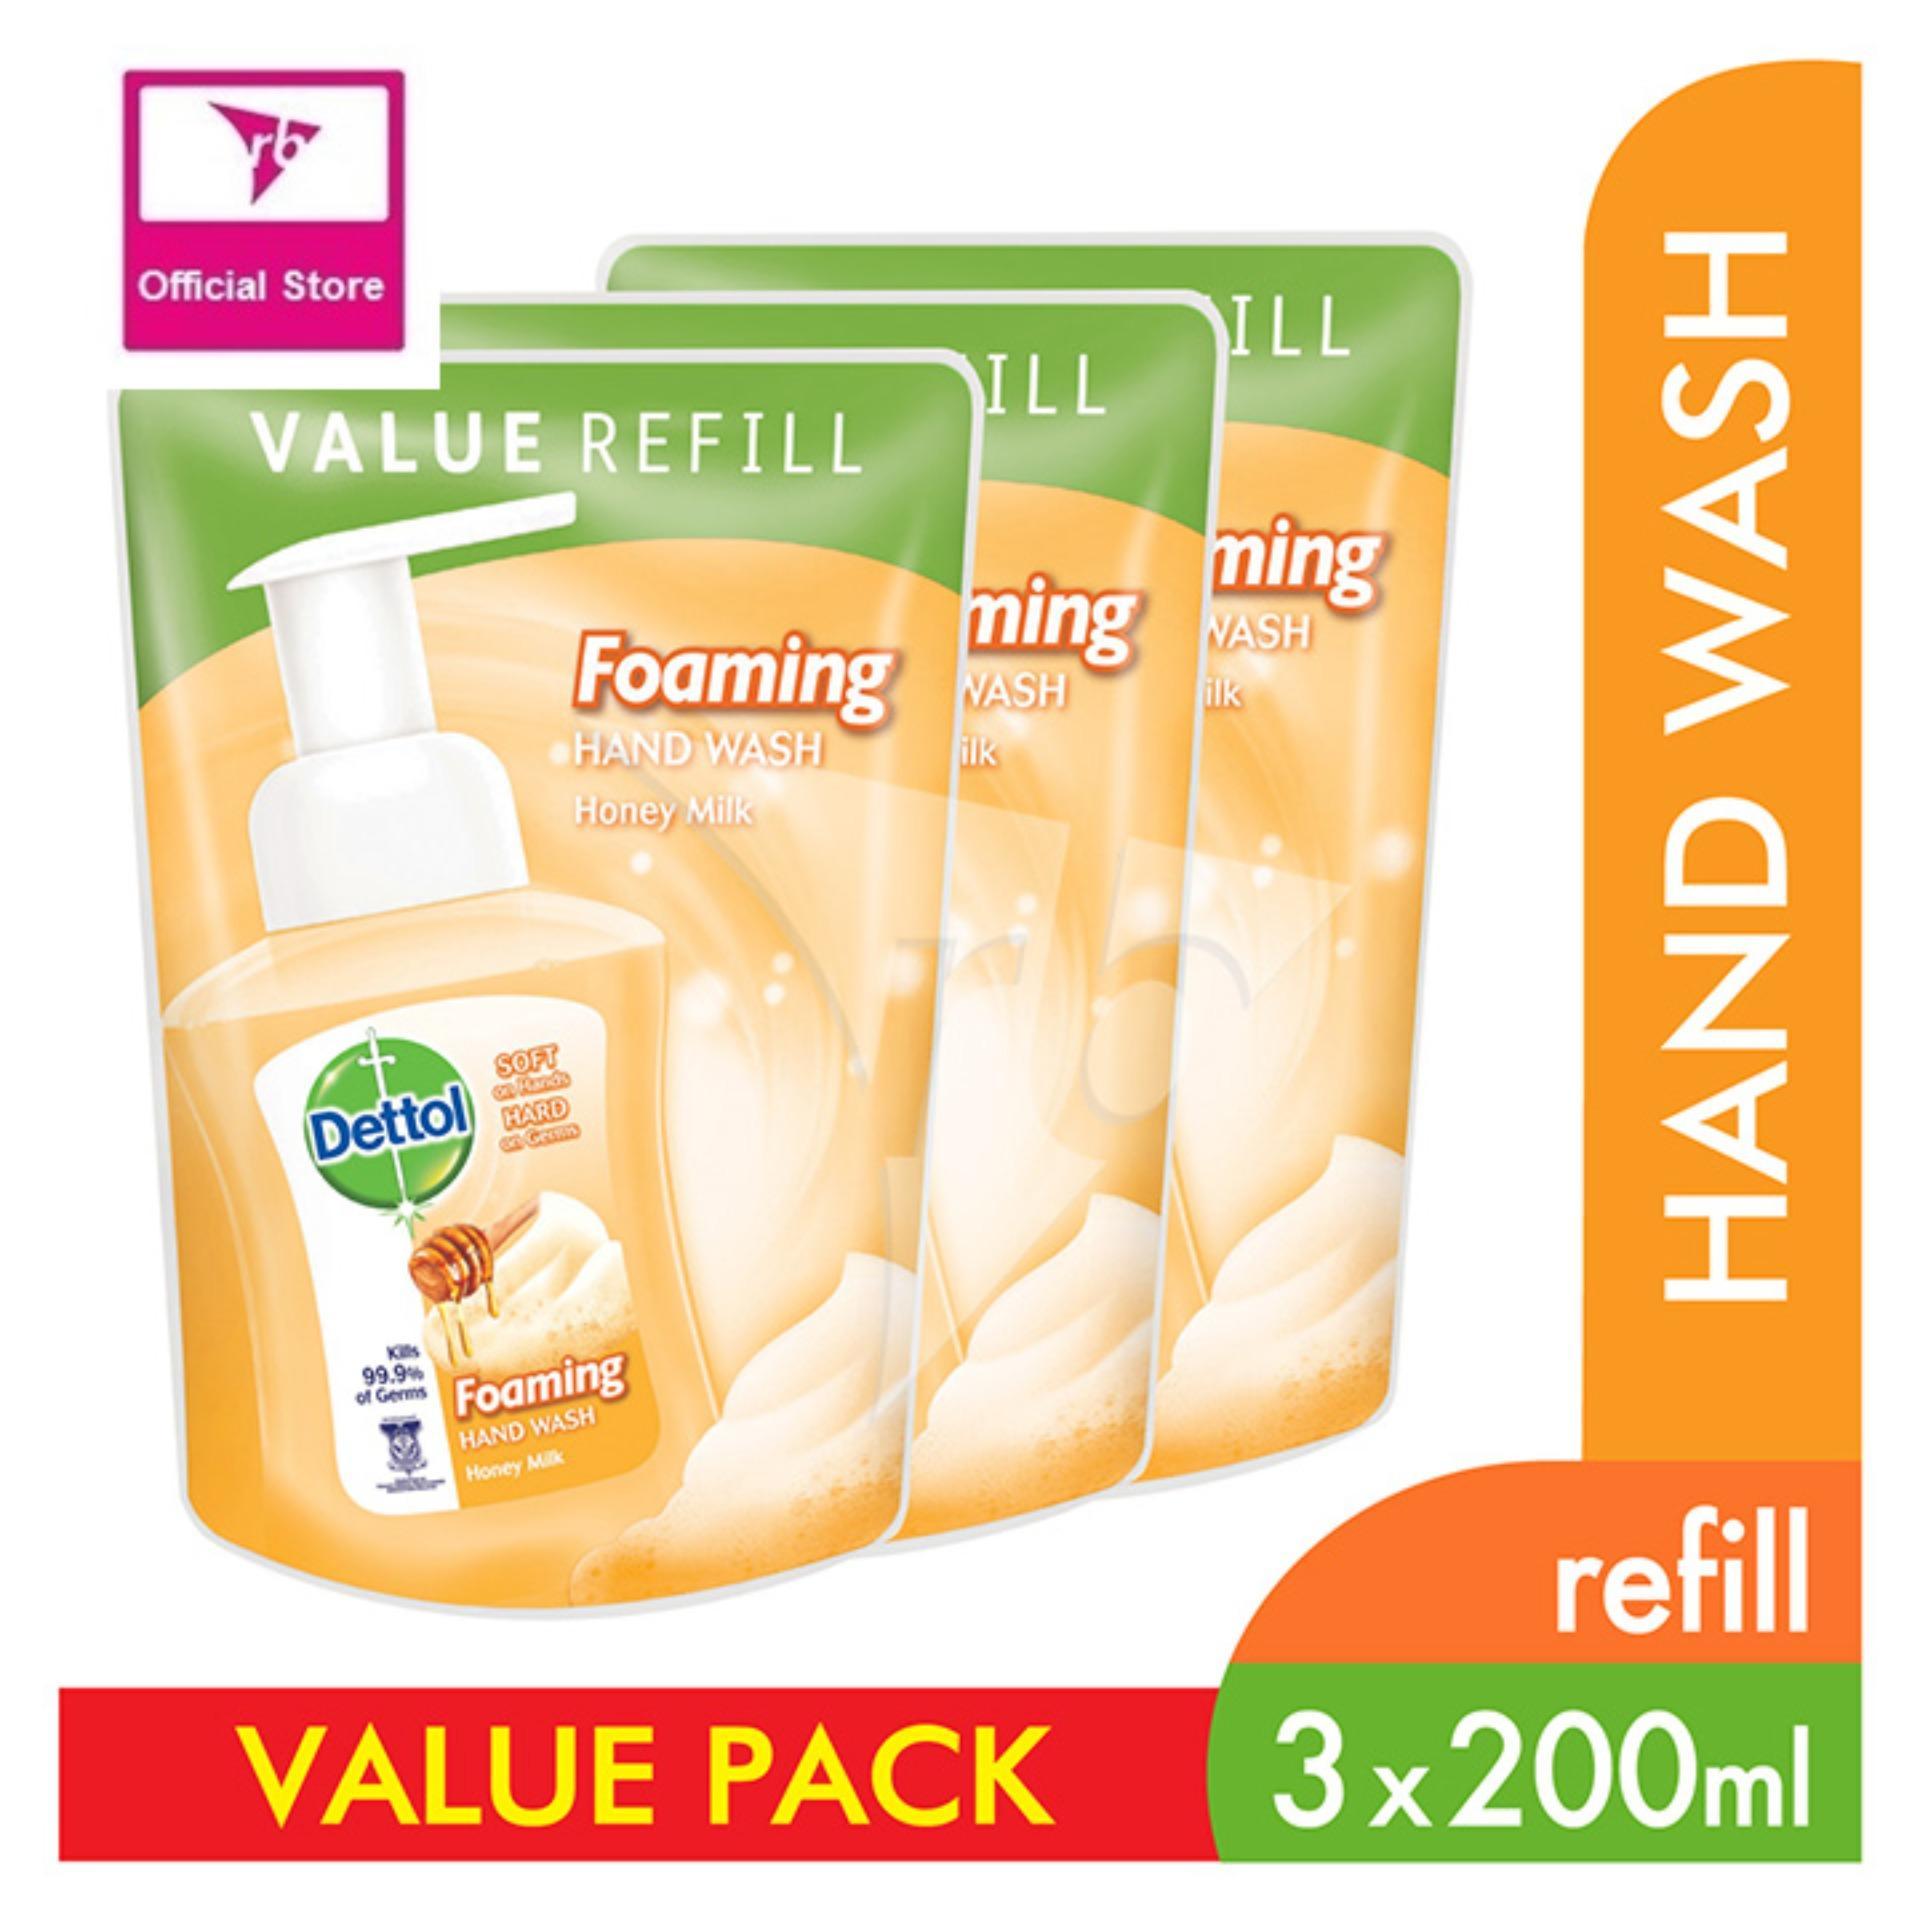 Buy Latest Bath Products Body Care Lazada Dettol Gold 250ml X2pcs Wash Classic Clean Reffil Antibacterial Foaming Hand Honey Milk Refill Pouch 200ml X 3